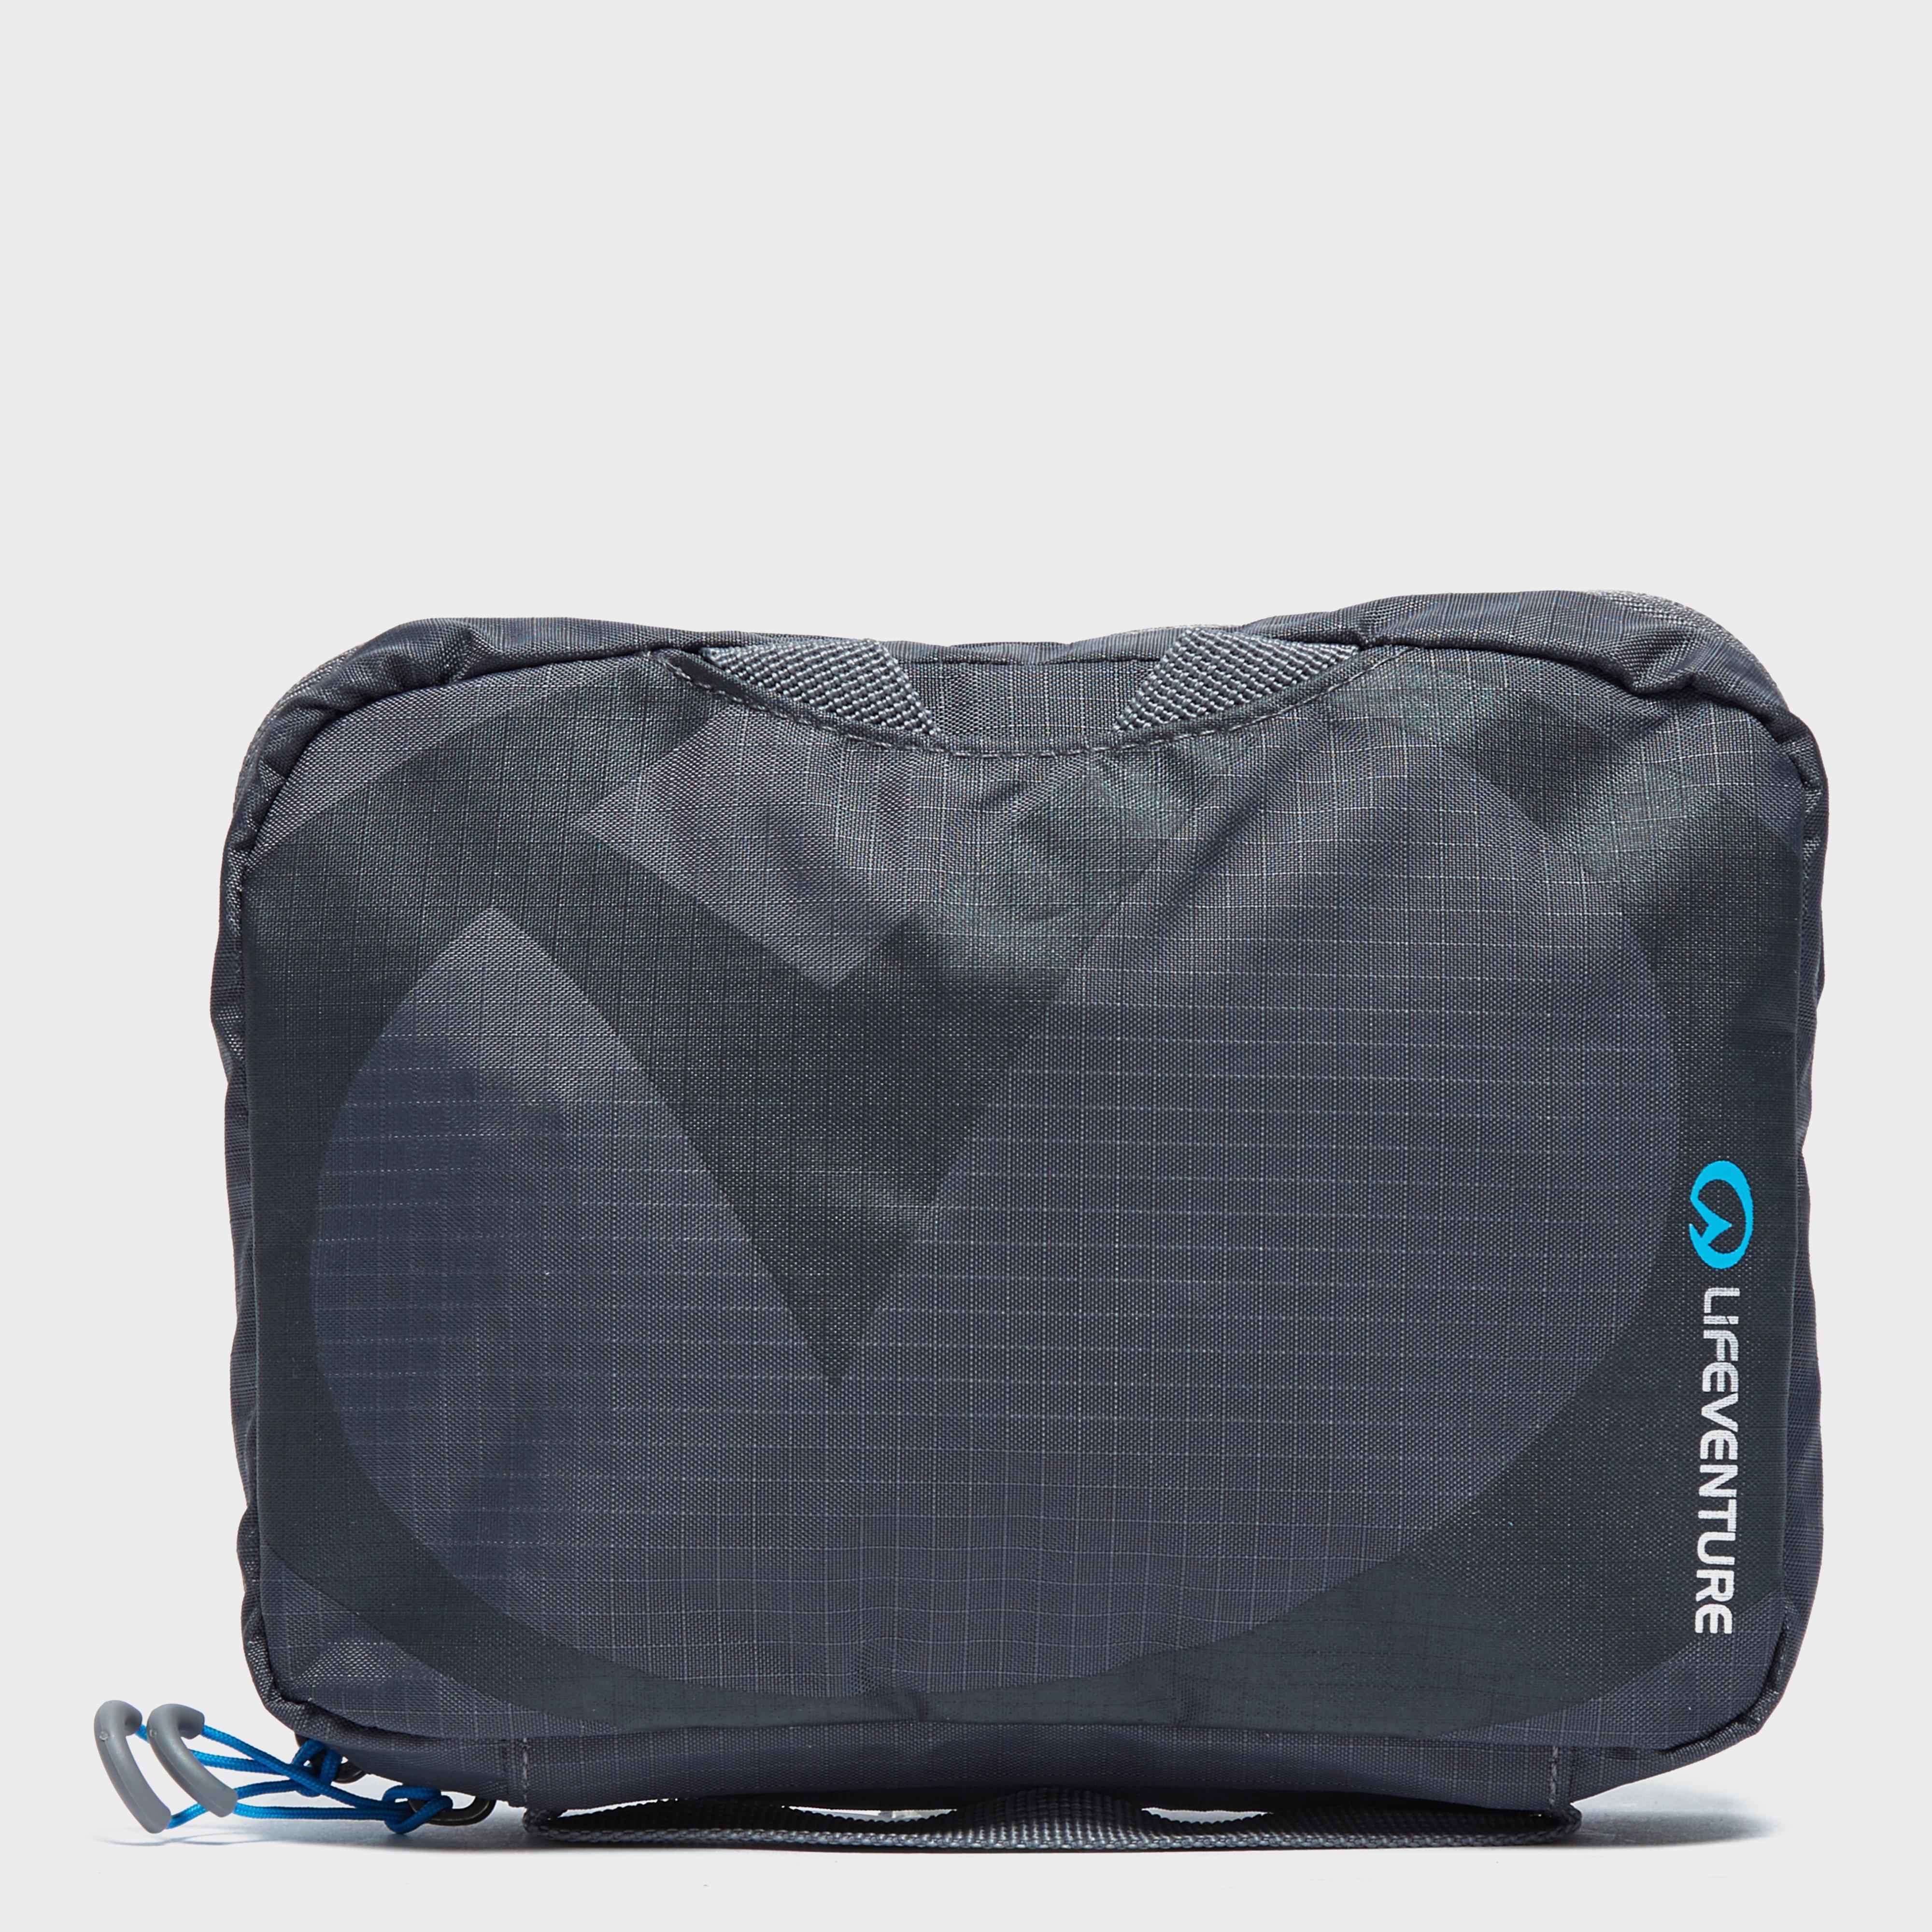 Lifeventure Travel Wash Bag (Small), Dark Grey